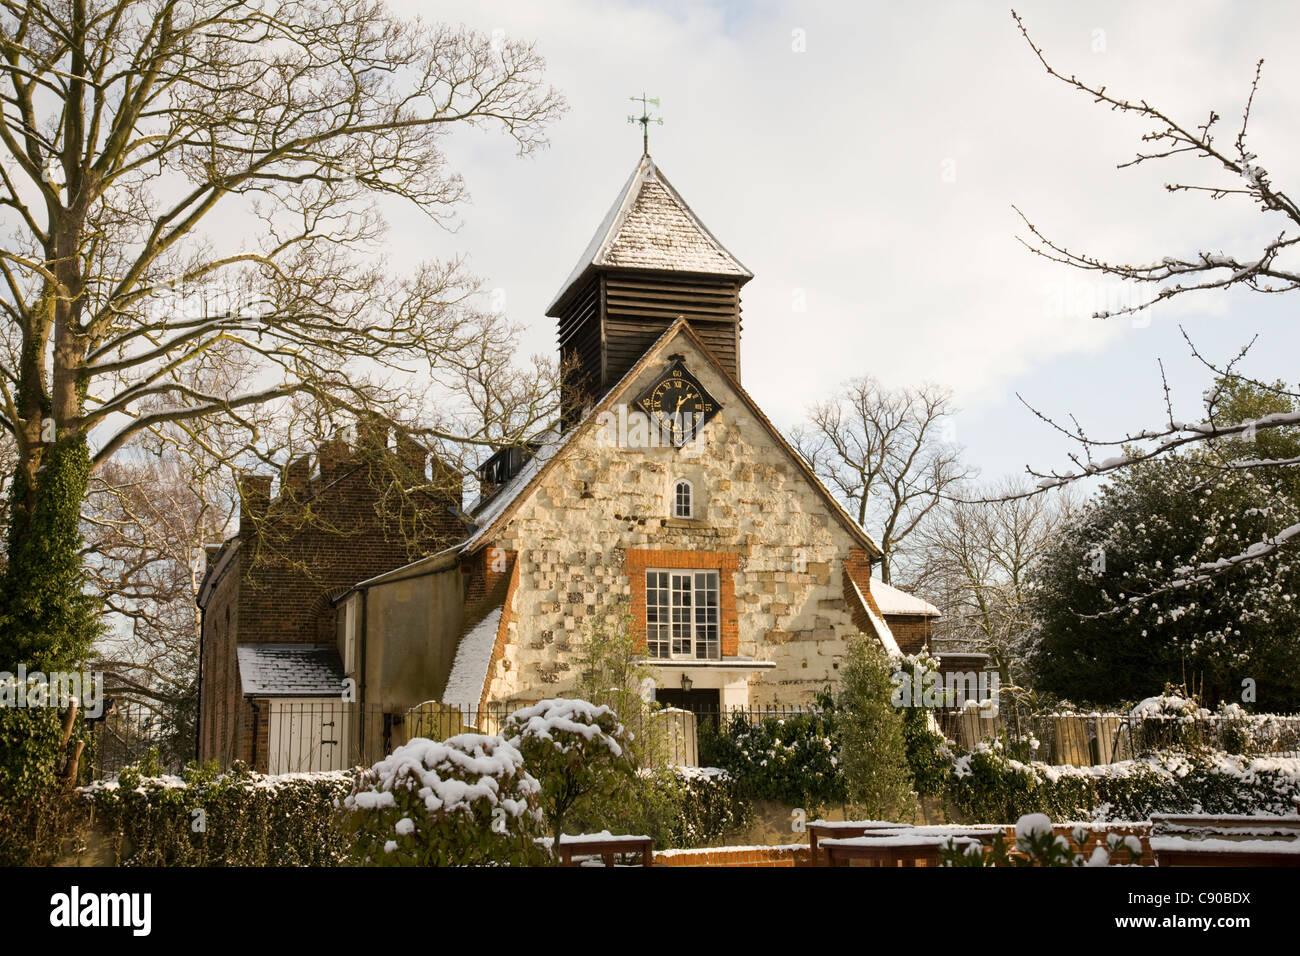 st george's church Esher, Surrey,England , esher's oldest